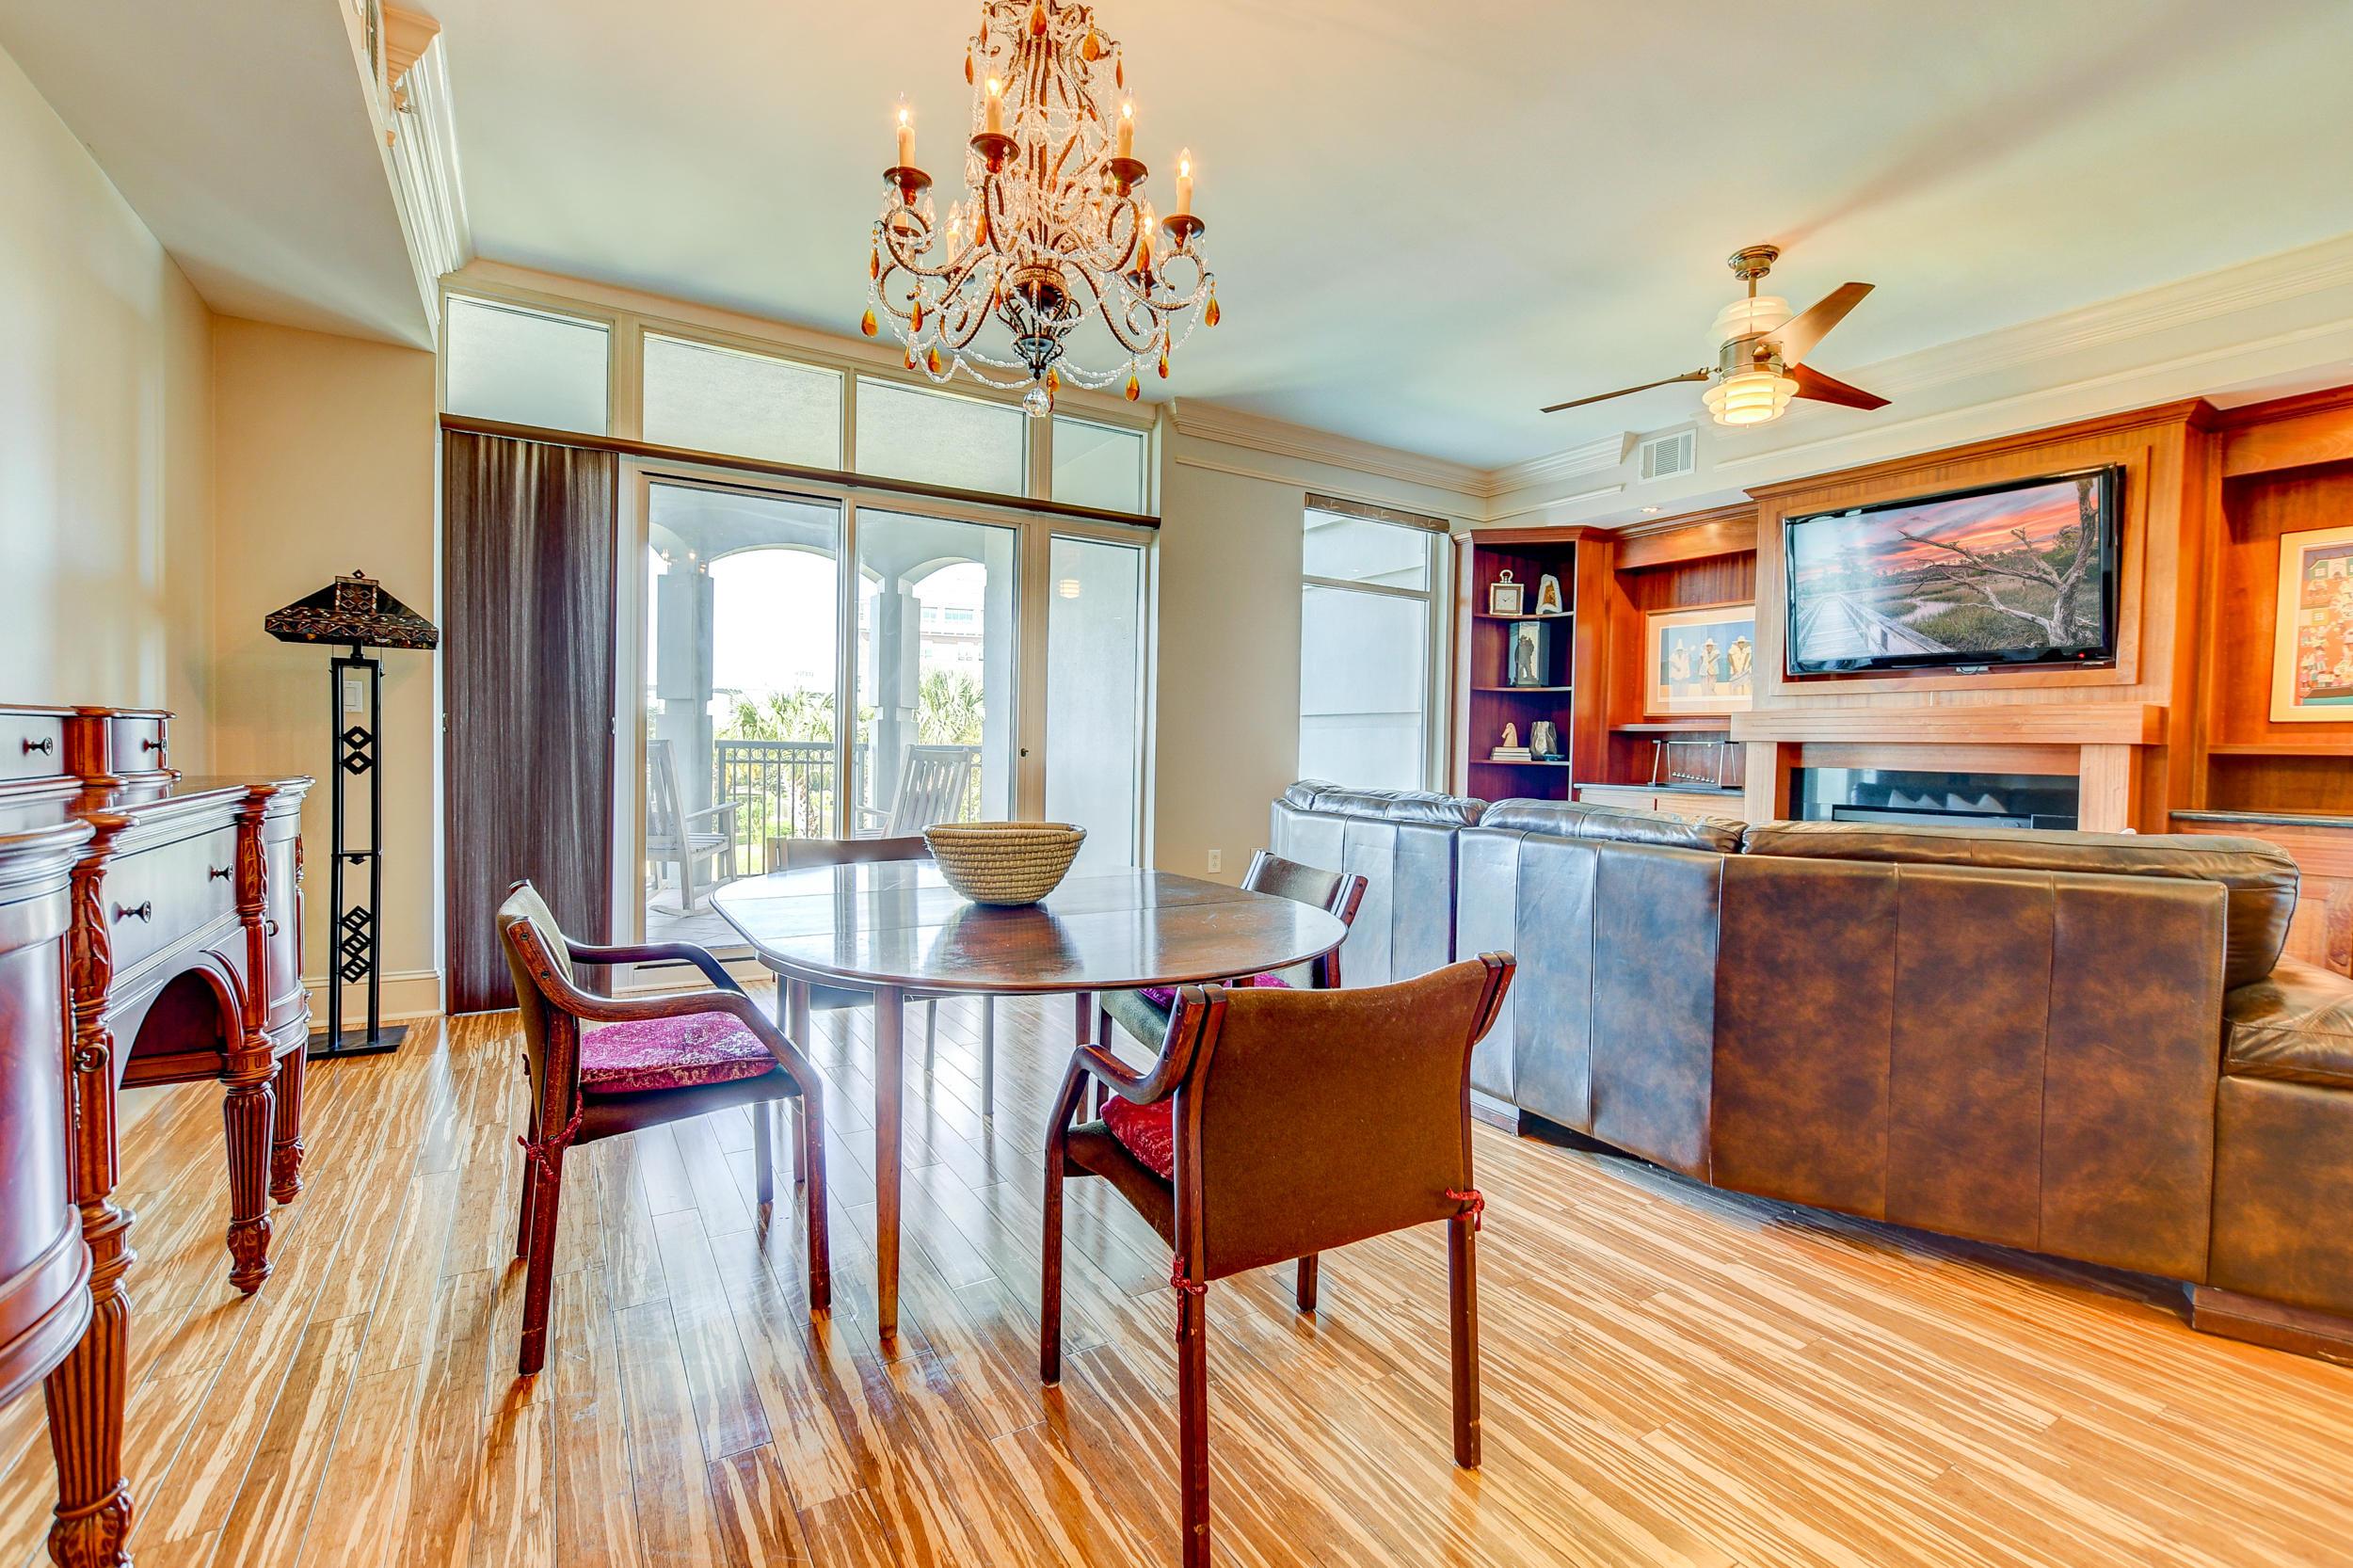 Renaissance On Chas Harbor Homes For Sale - 224 Plaza, Mount Pleasant, SC - 30